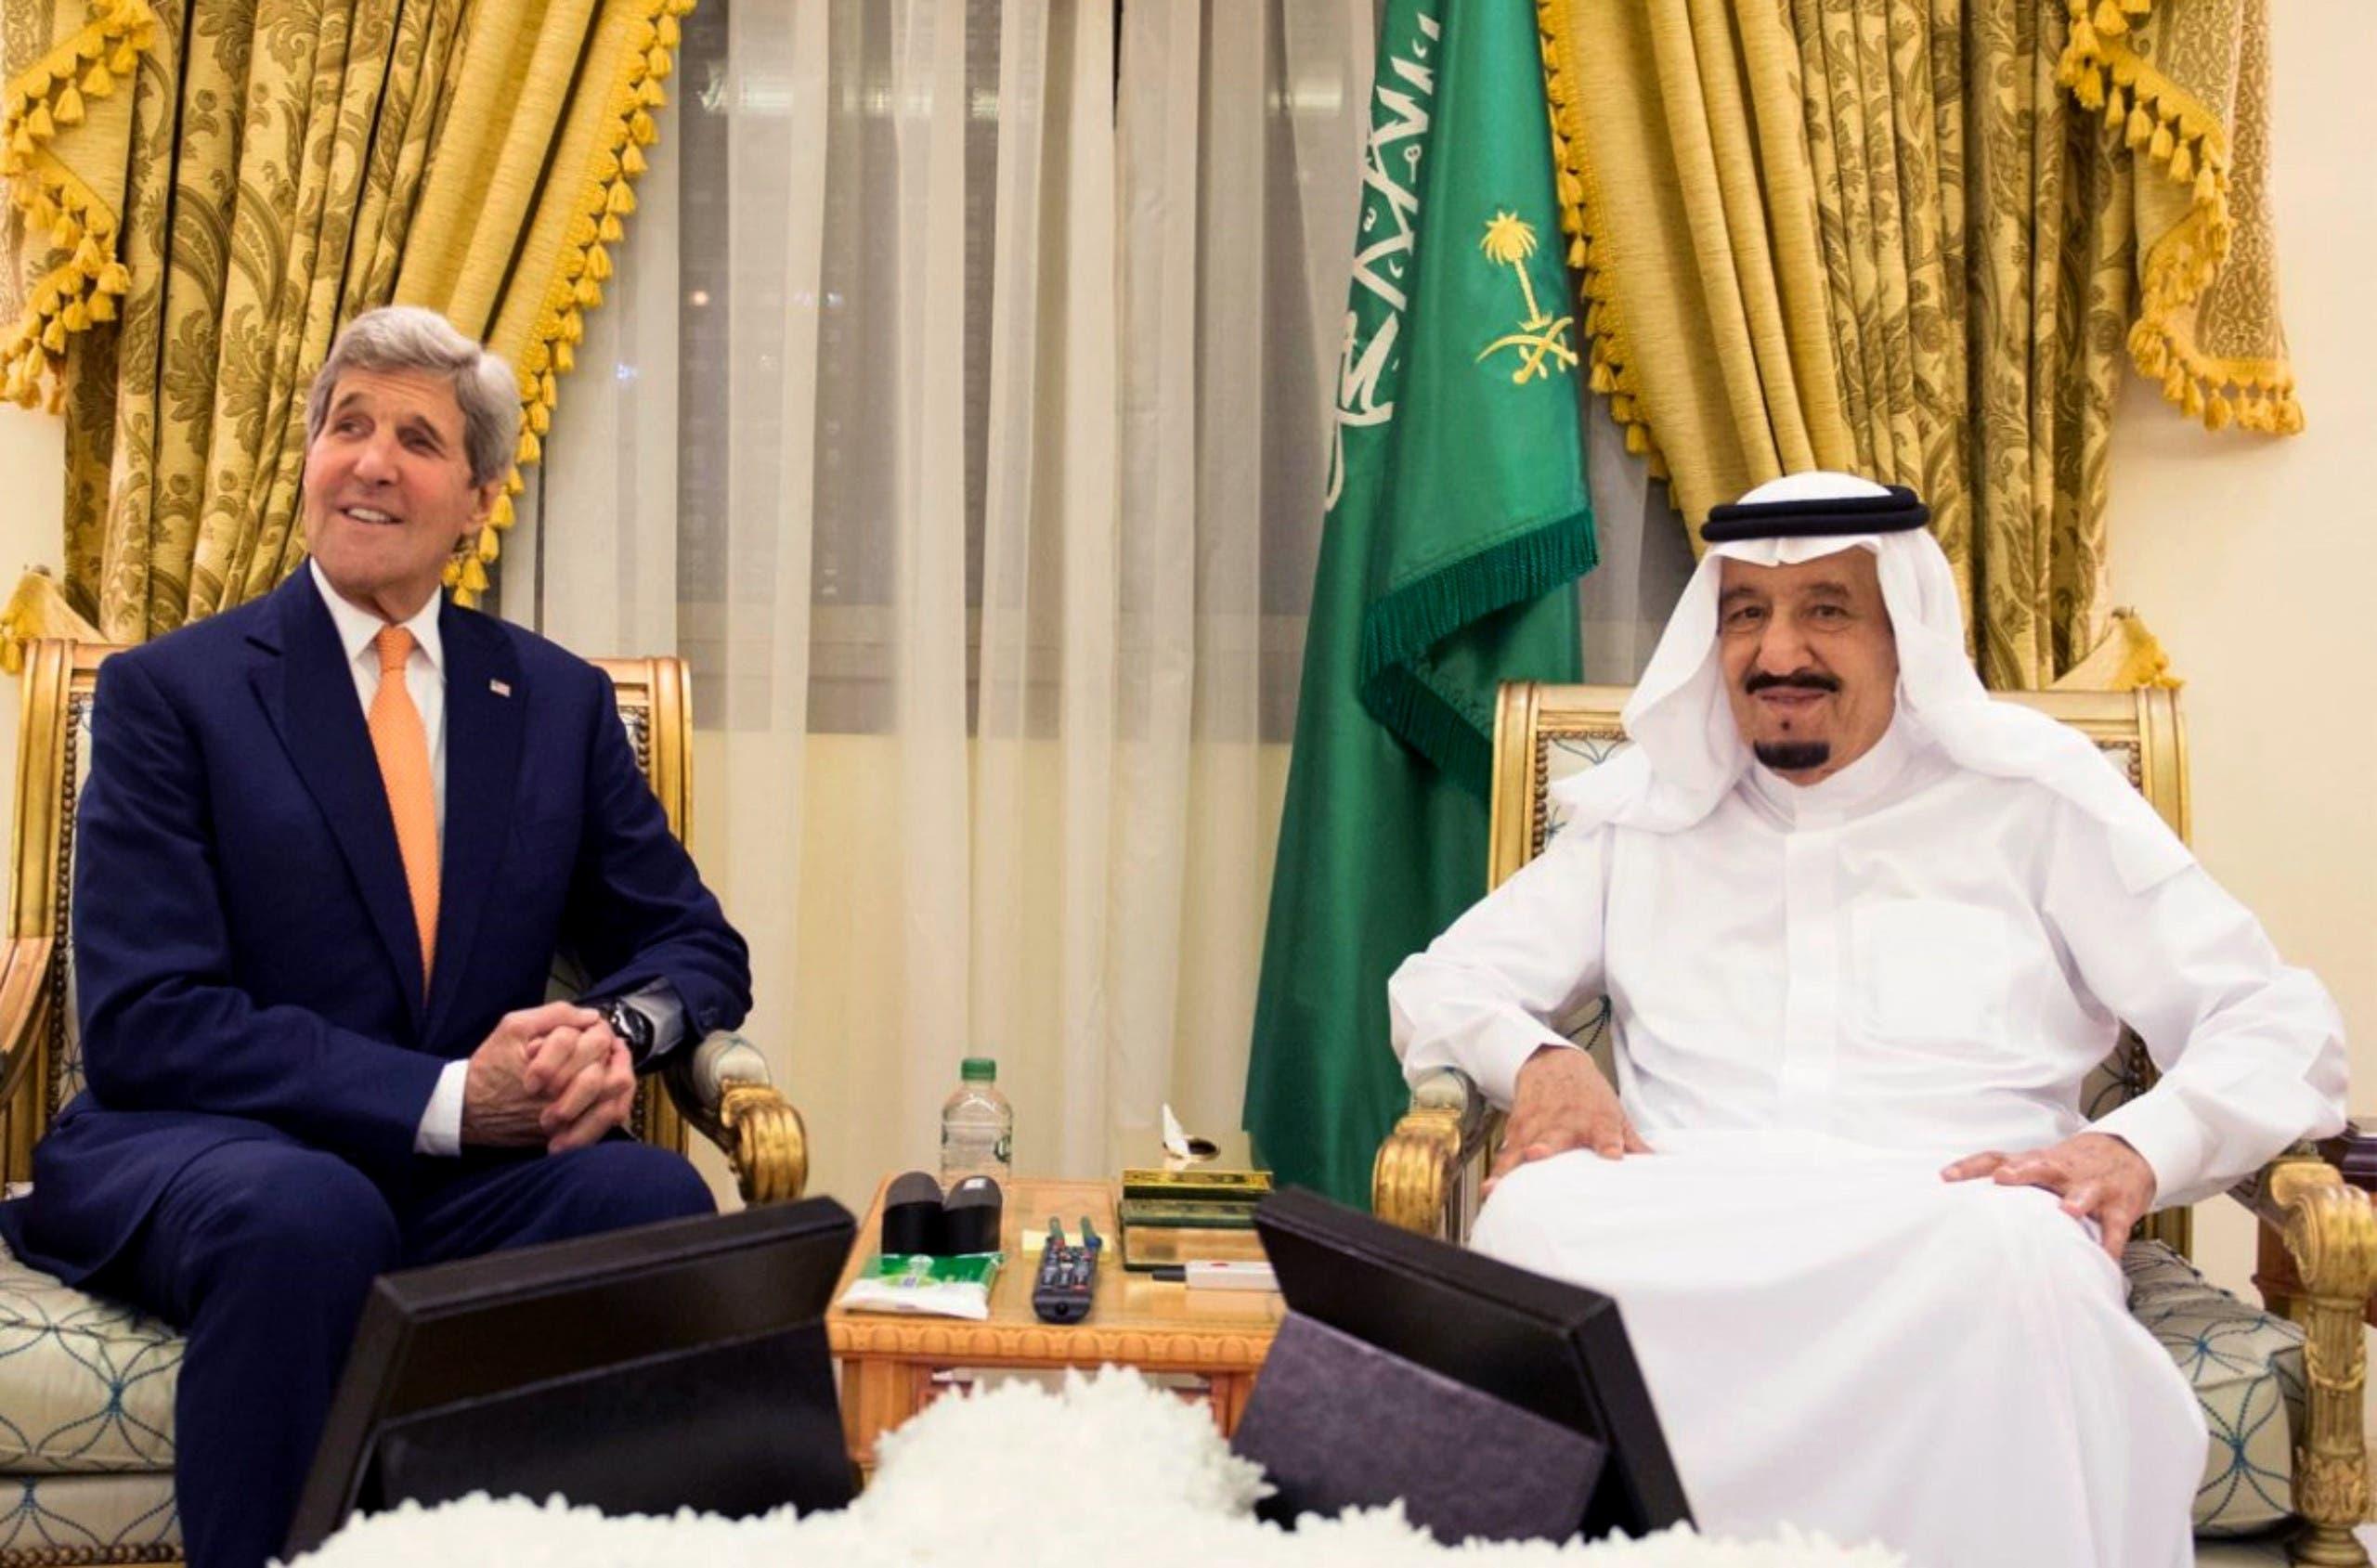 picture provided by the Saudi Press Agency (SPA) on March 11, 2016 shows Saudi King Salman bin Abdulaziz (R) meeting with United States Secretary of State John Kerry in Hafar al-Batin 500 km north east of the Saudi capital Riyadh. (AFP)